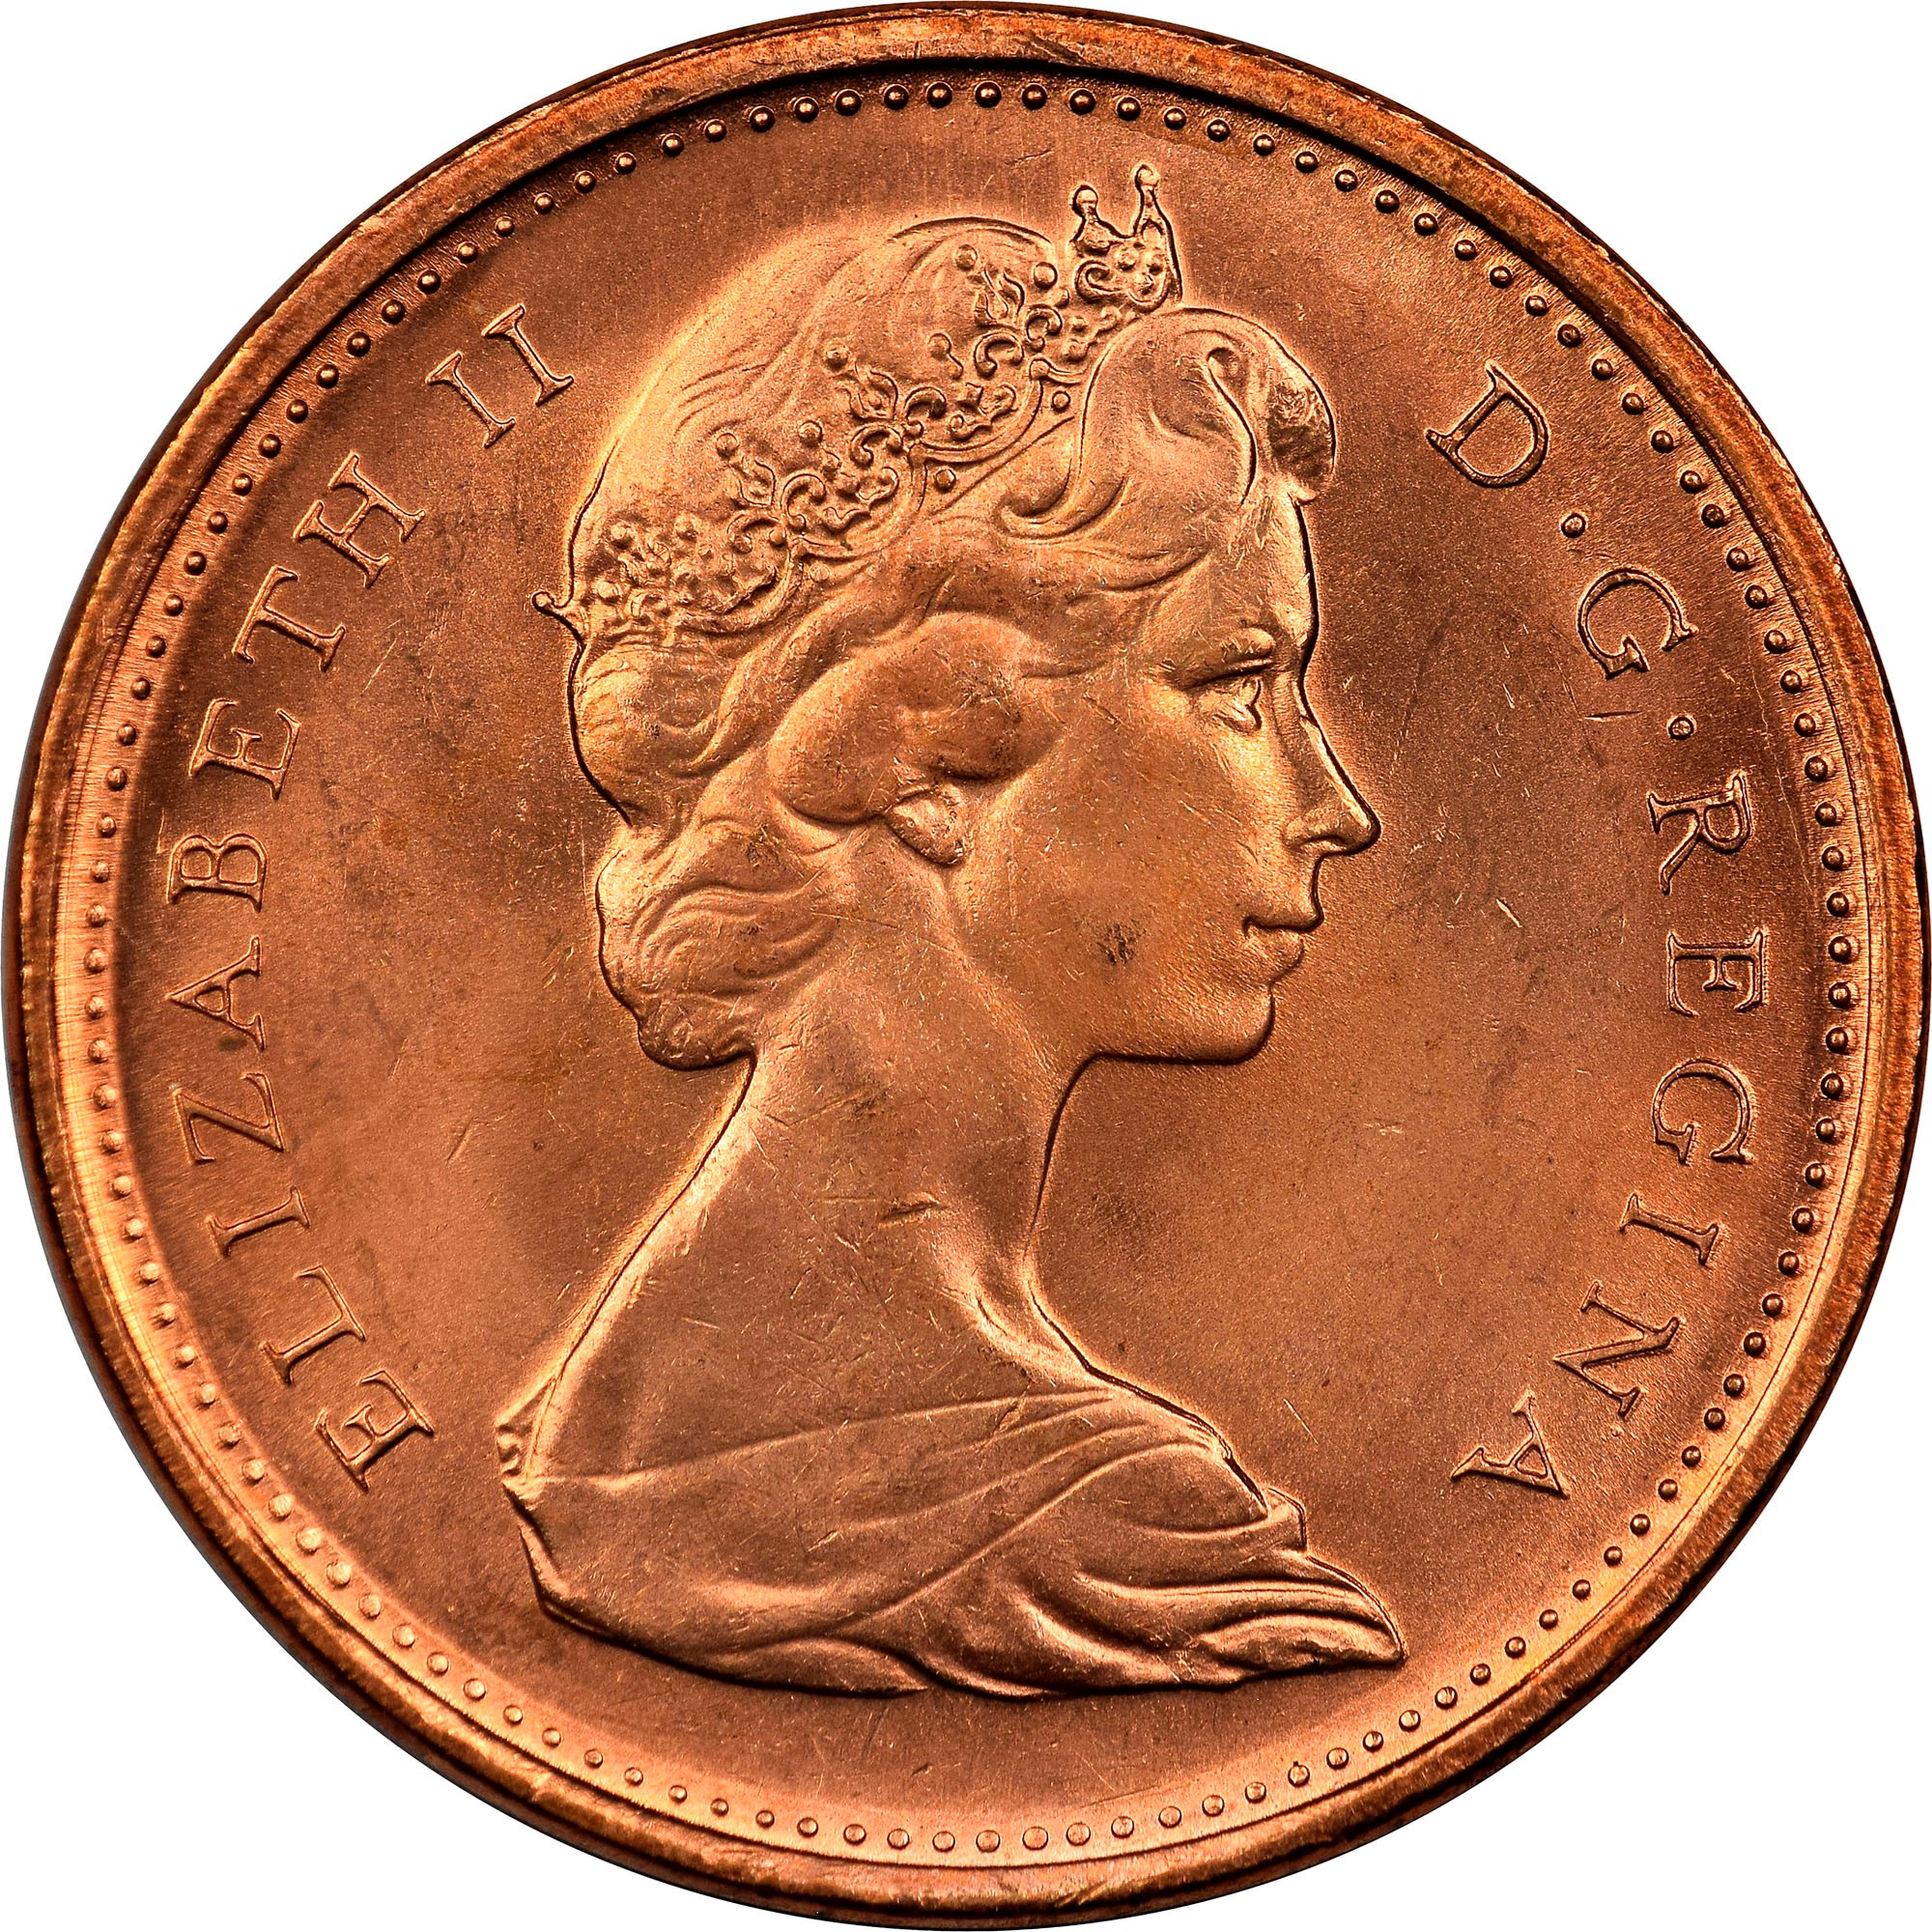 Canada Cent obverse